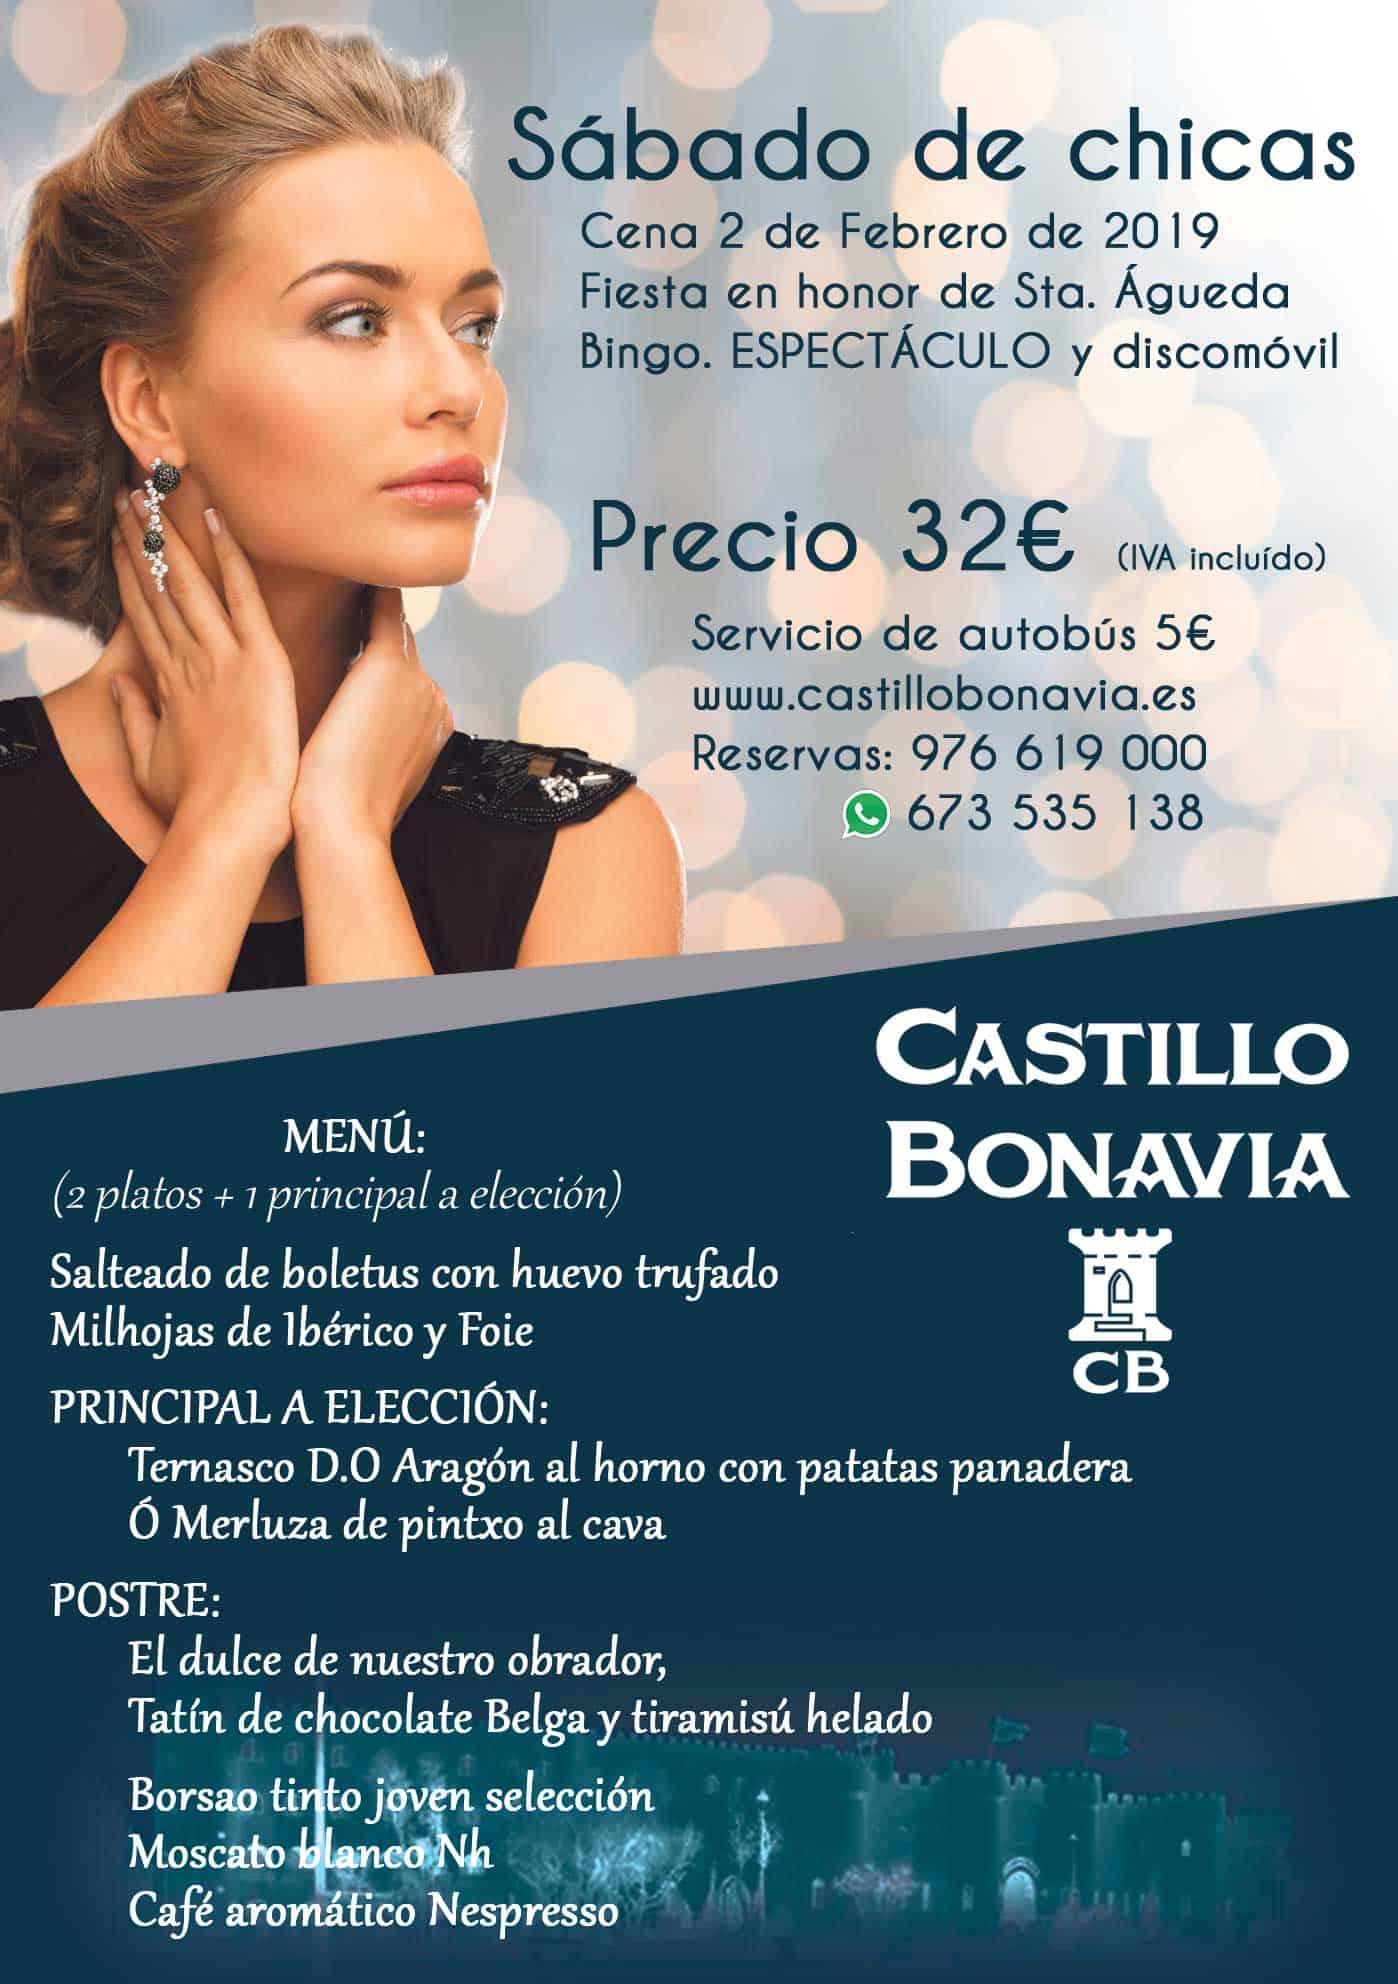 castillo_bonavia_Santa_Agueda-2019